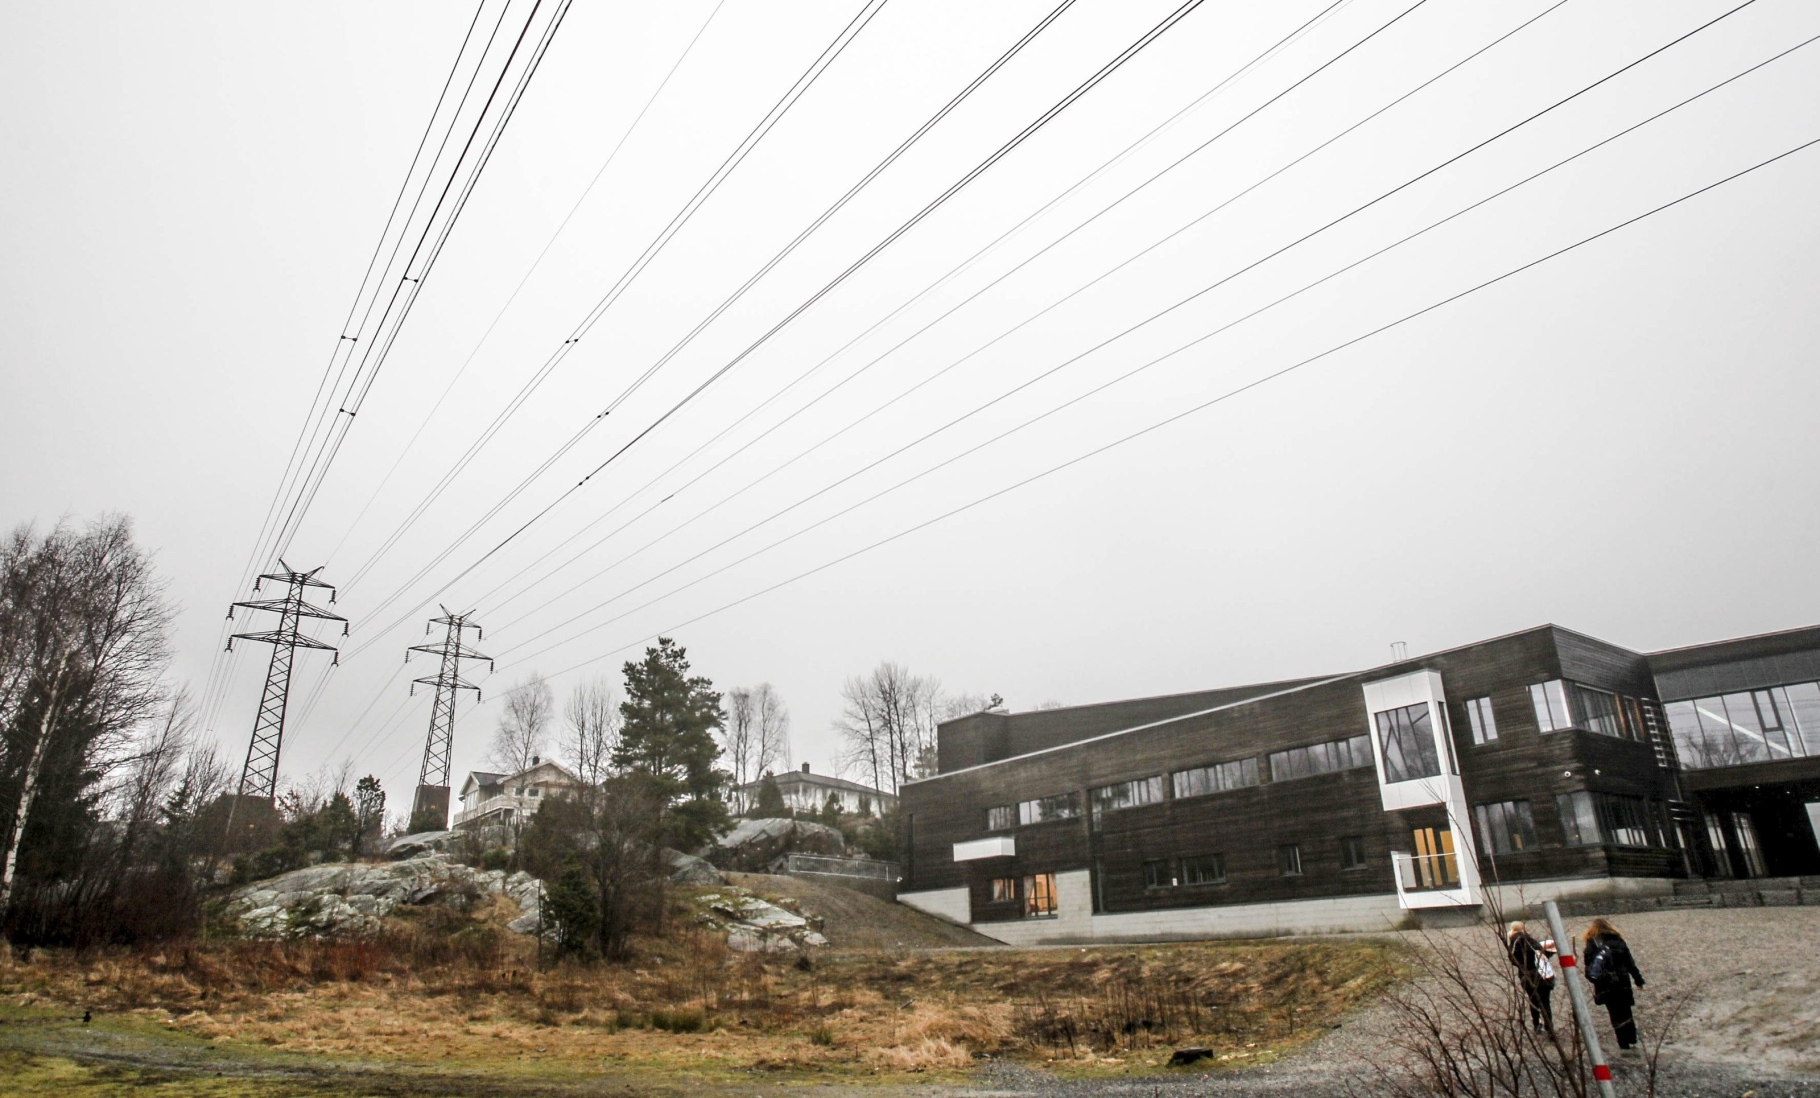 sportsbutikk osloveien strømstad sandnes